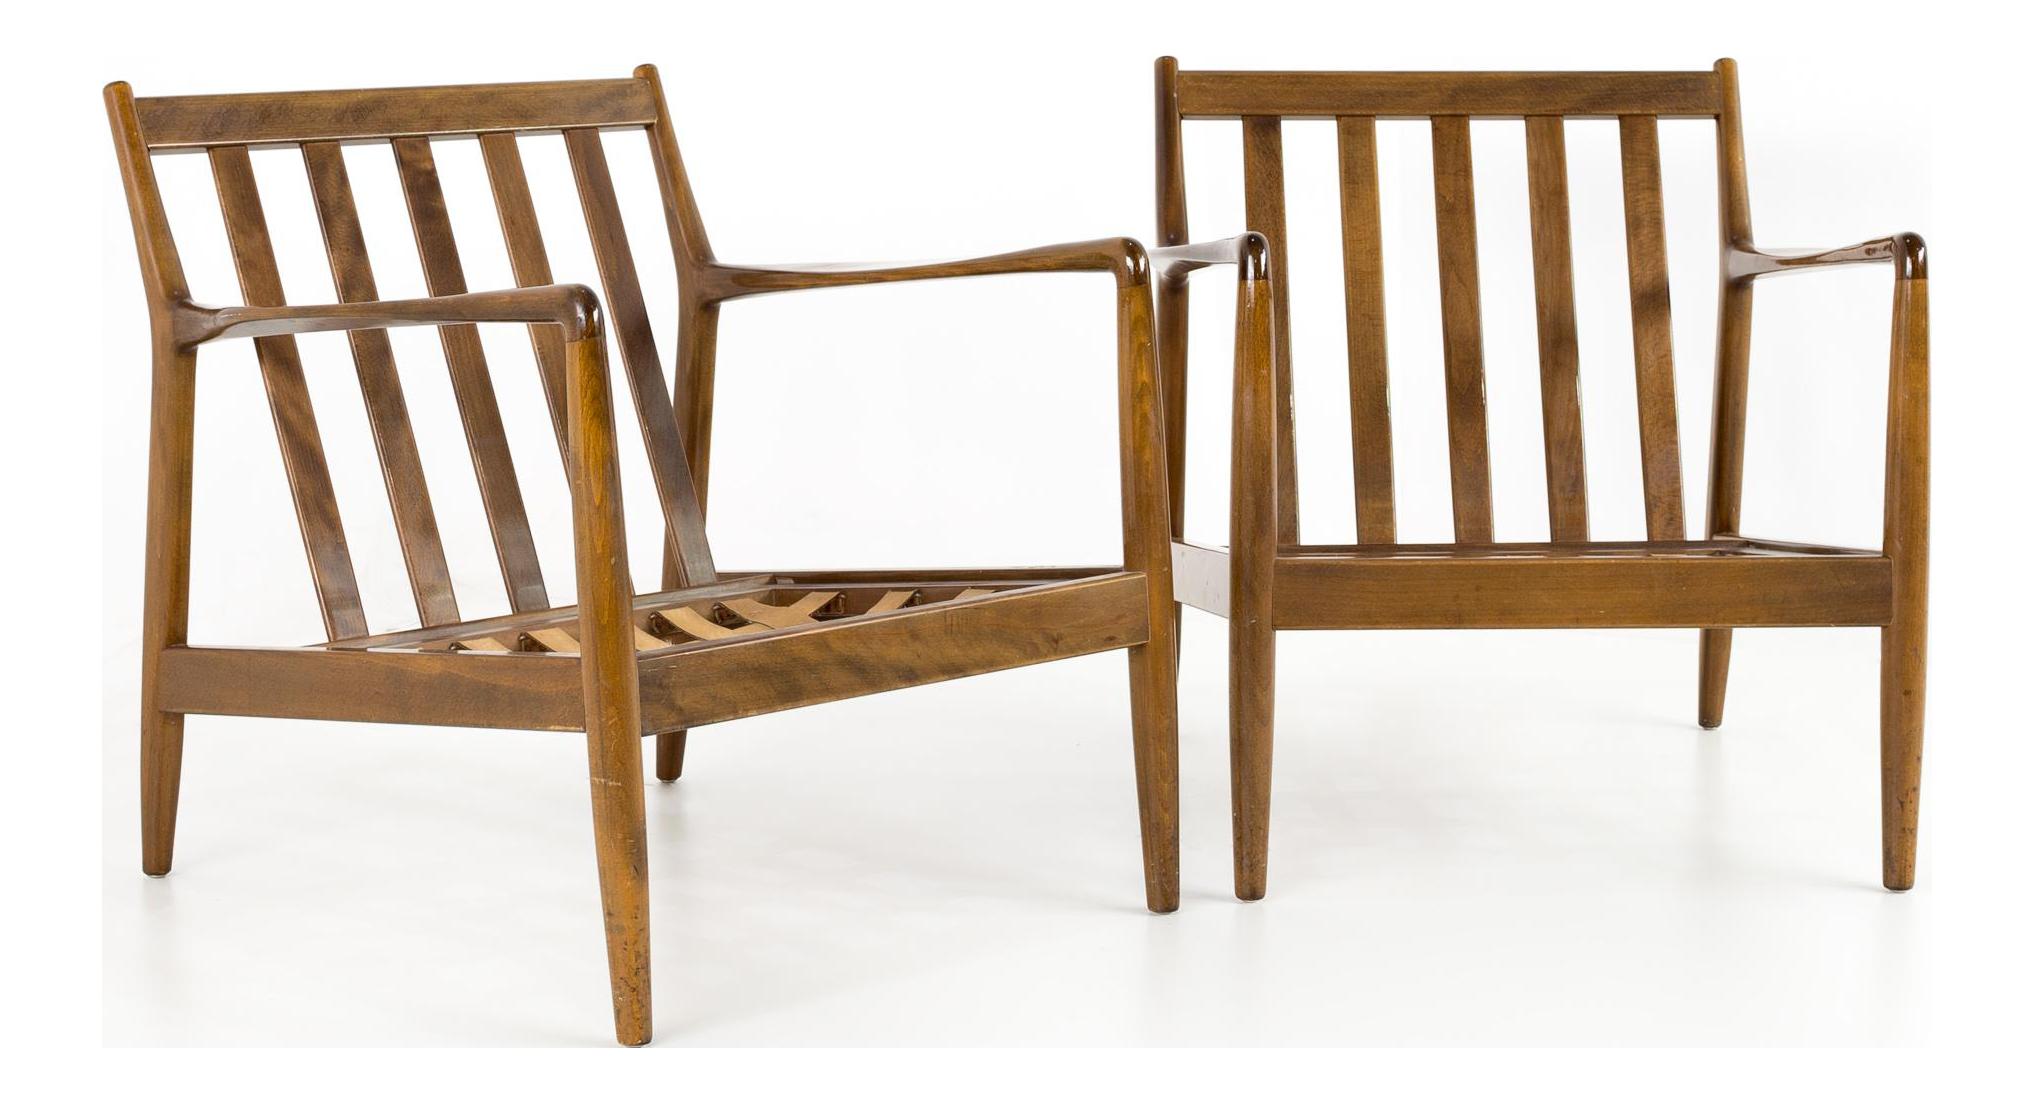 Awe Inspiring 1960S Mid Century Modern Folke Ohlsson For Dux Danish Lounge Chairs A Pair Machost Co Dining Chair Design Ideas Machostcouk